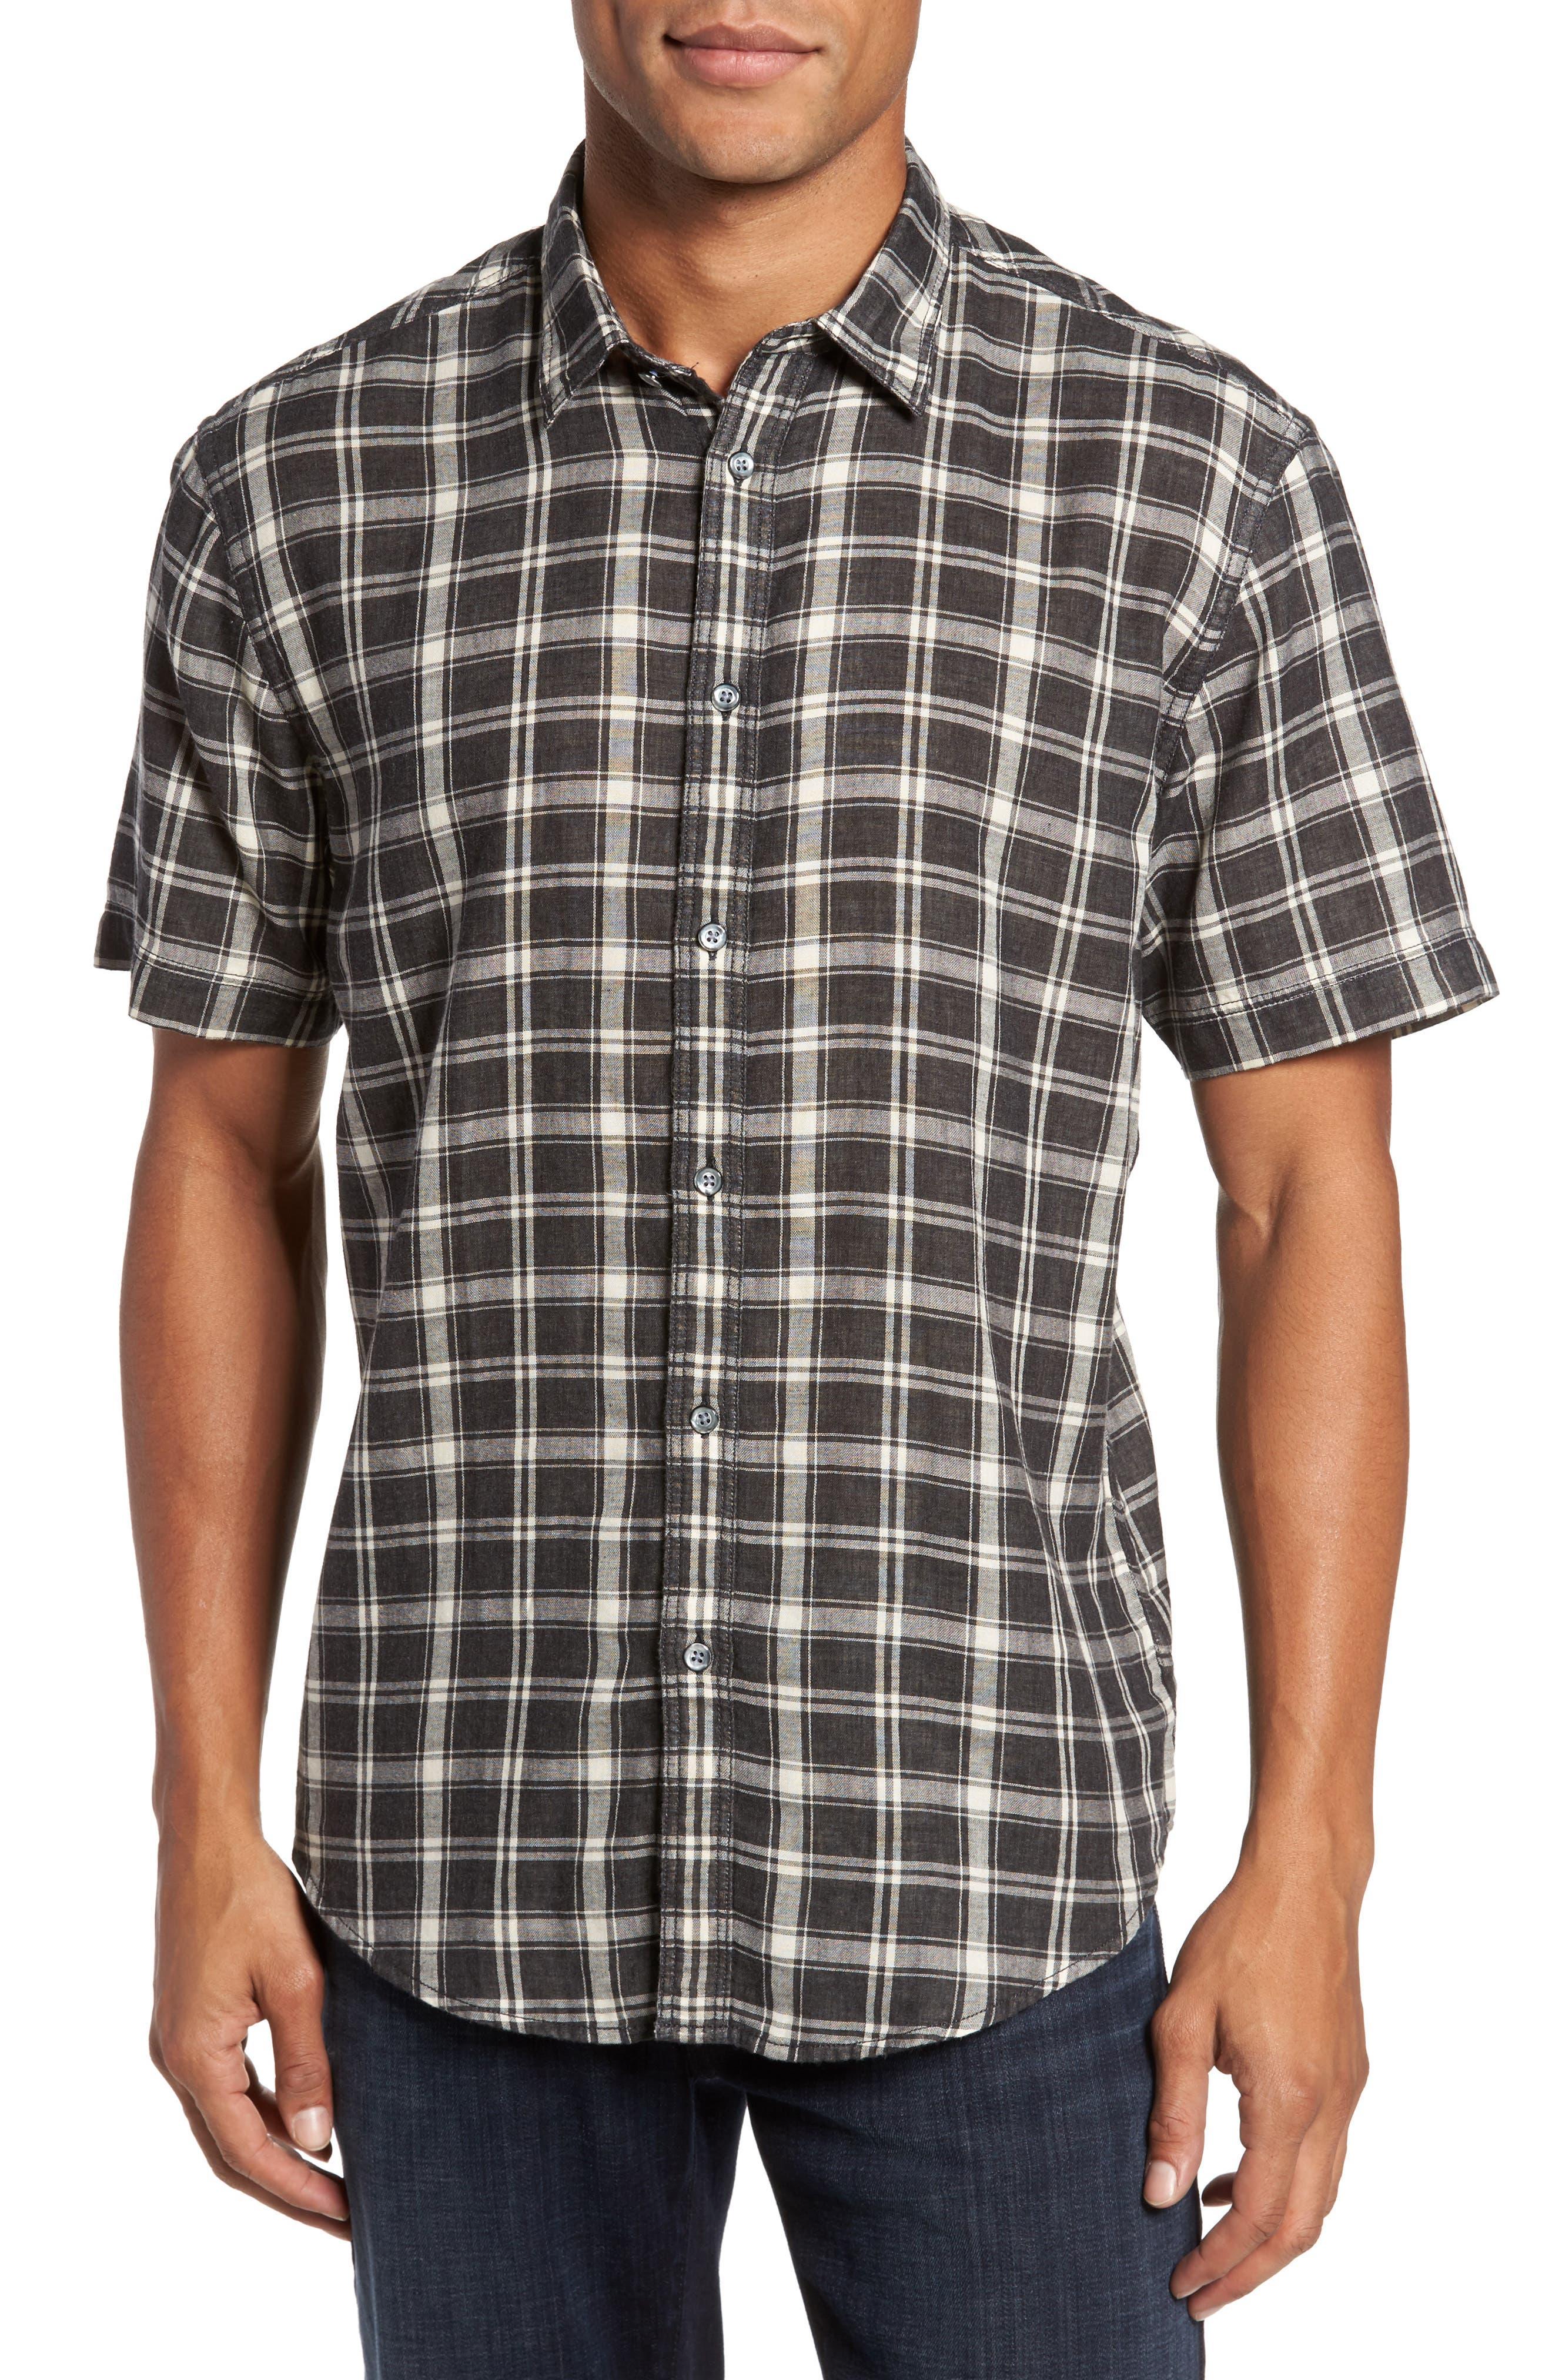 Main Image - Coastaoro Hansen Regular Fit Plaid Sport Shirt